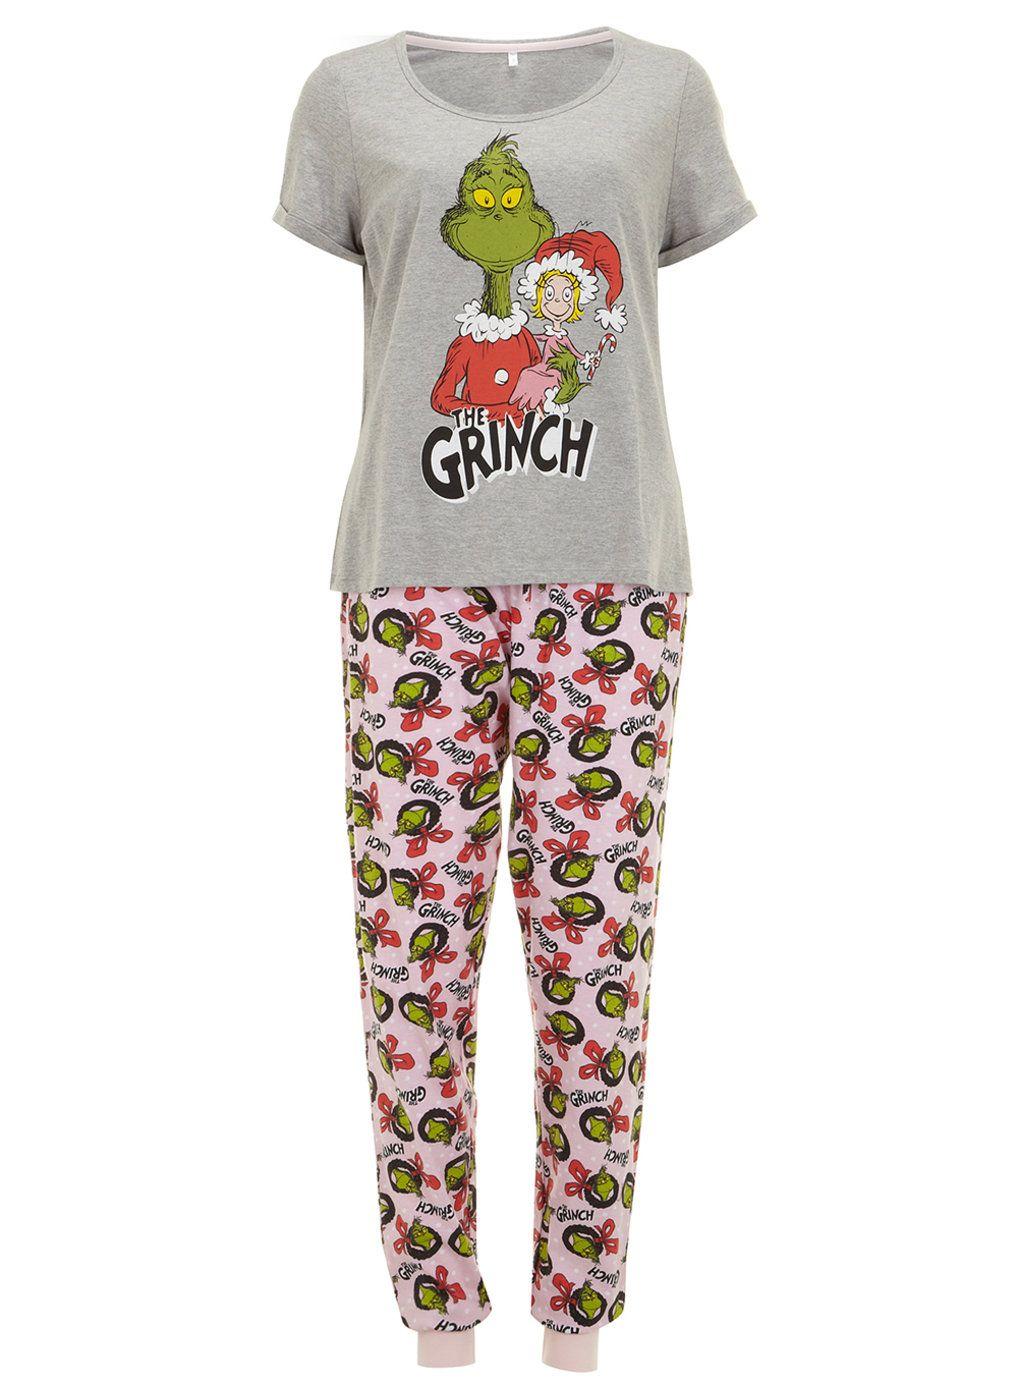 Pink Grinch Pyjamas - Nightwear - Clothing - Dorothy Perkins | AW16 ...